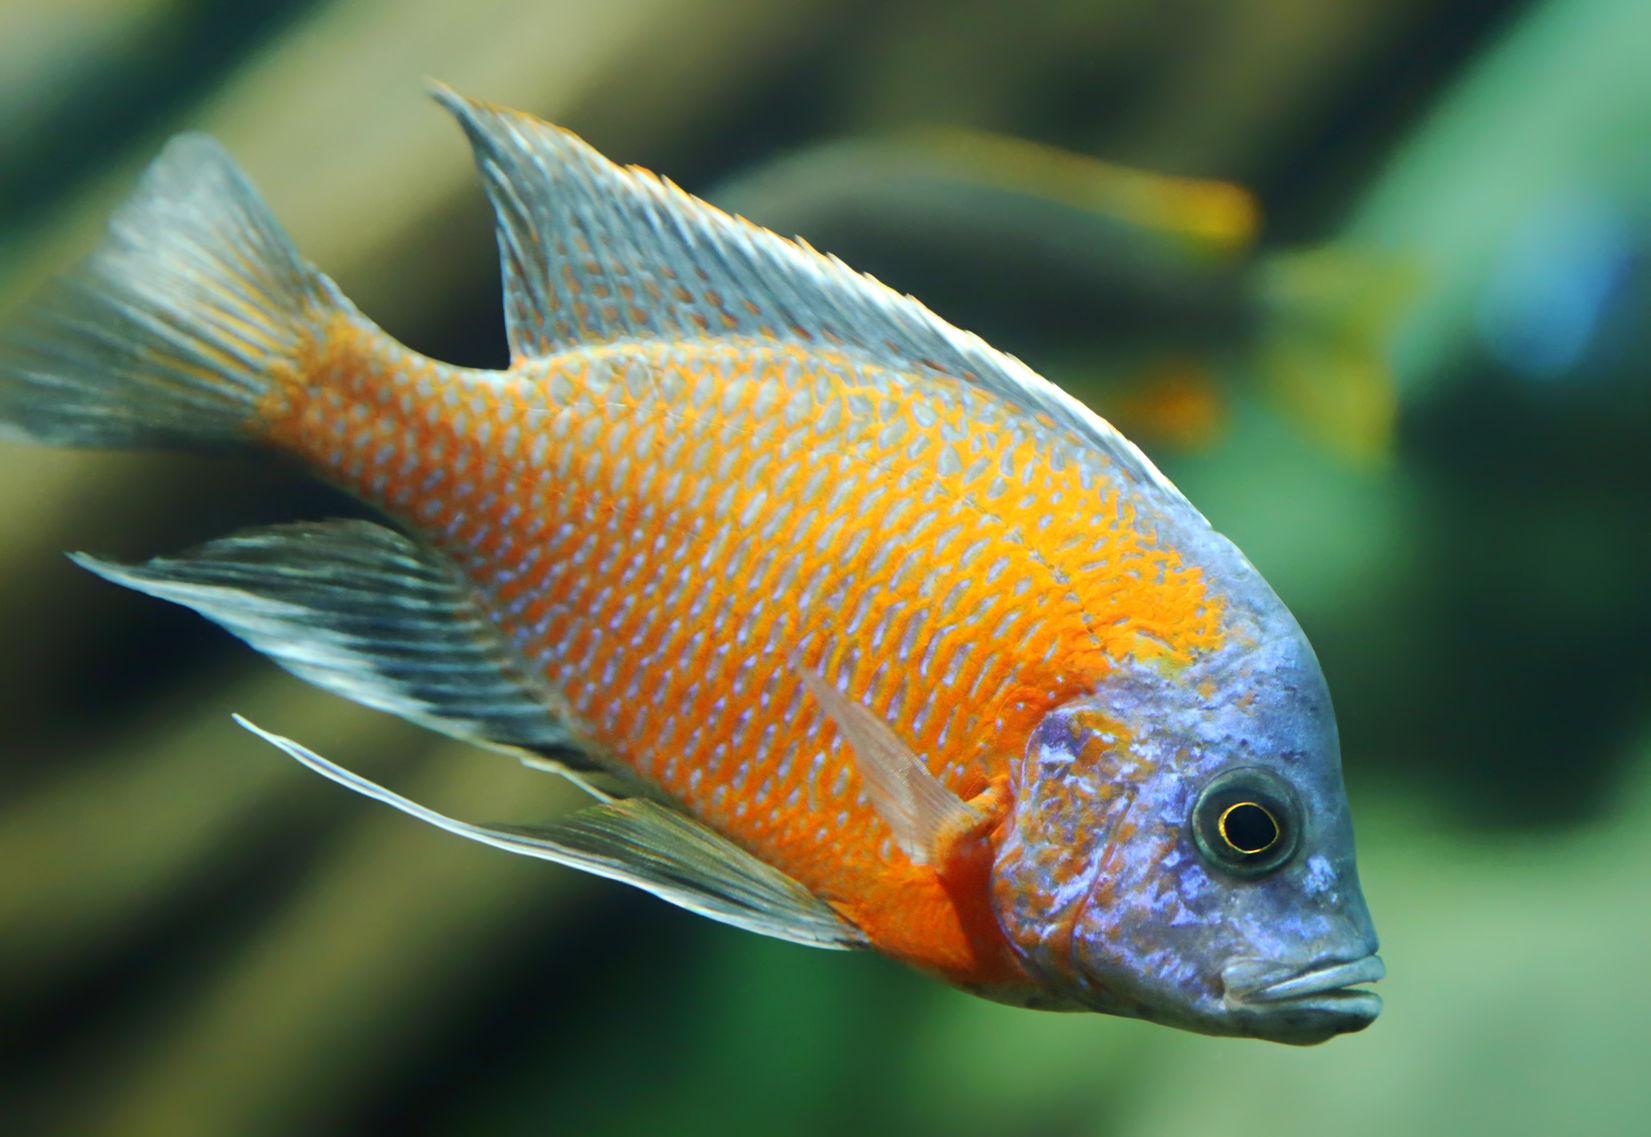 Copadichromis borleyi kadango red fin borleyi cichlid Freshwater fish with red fins